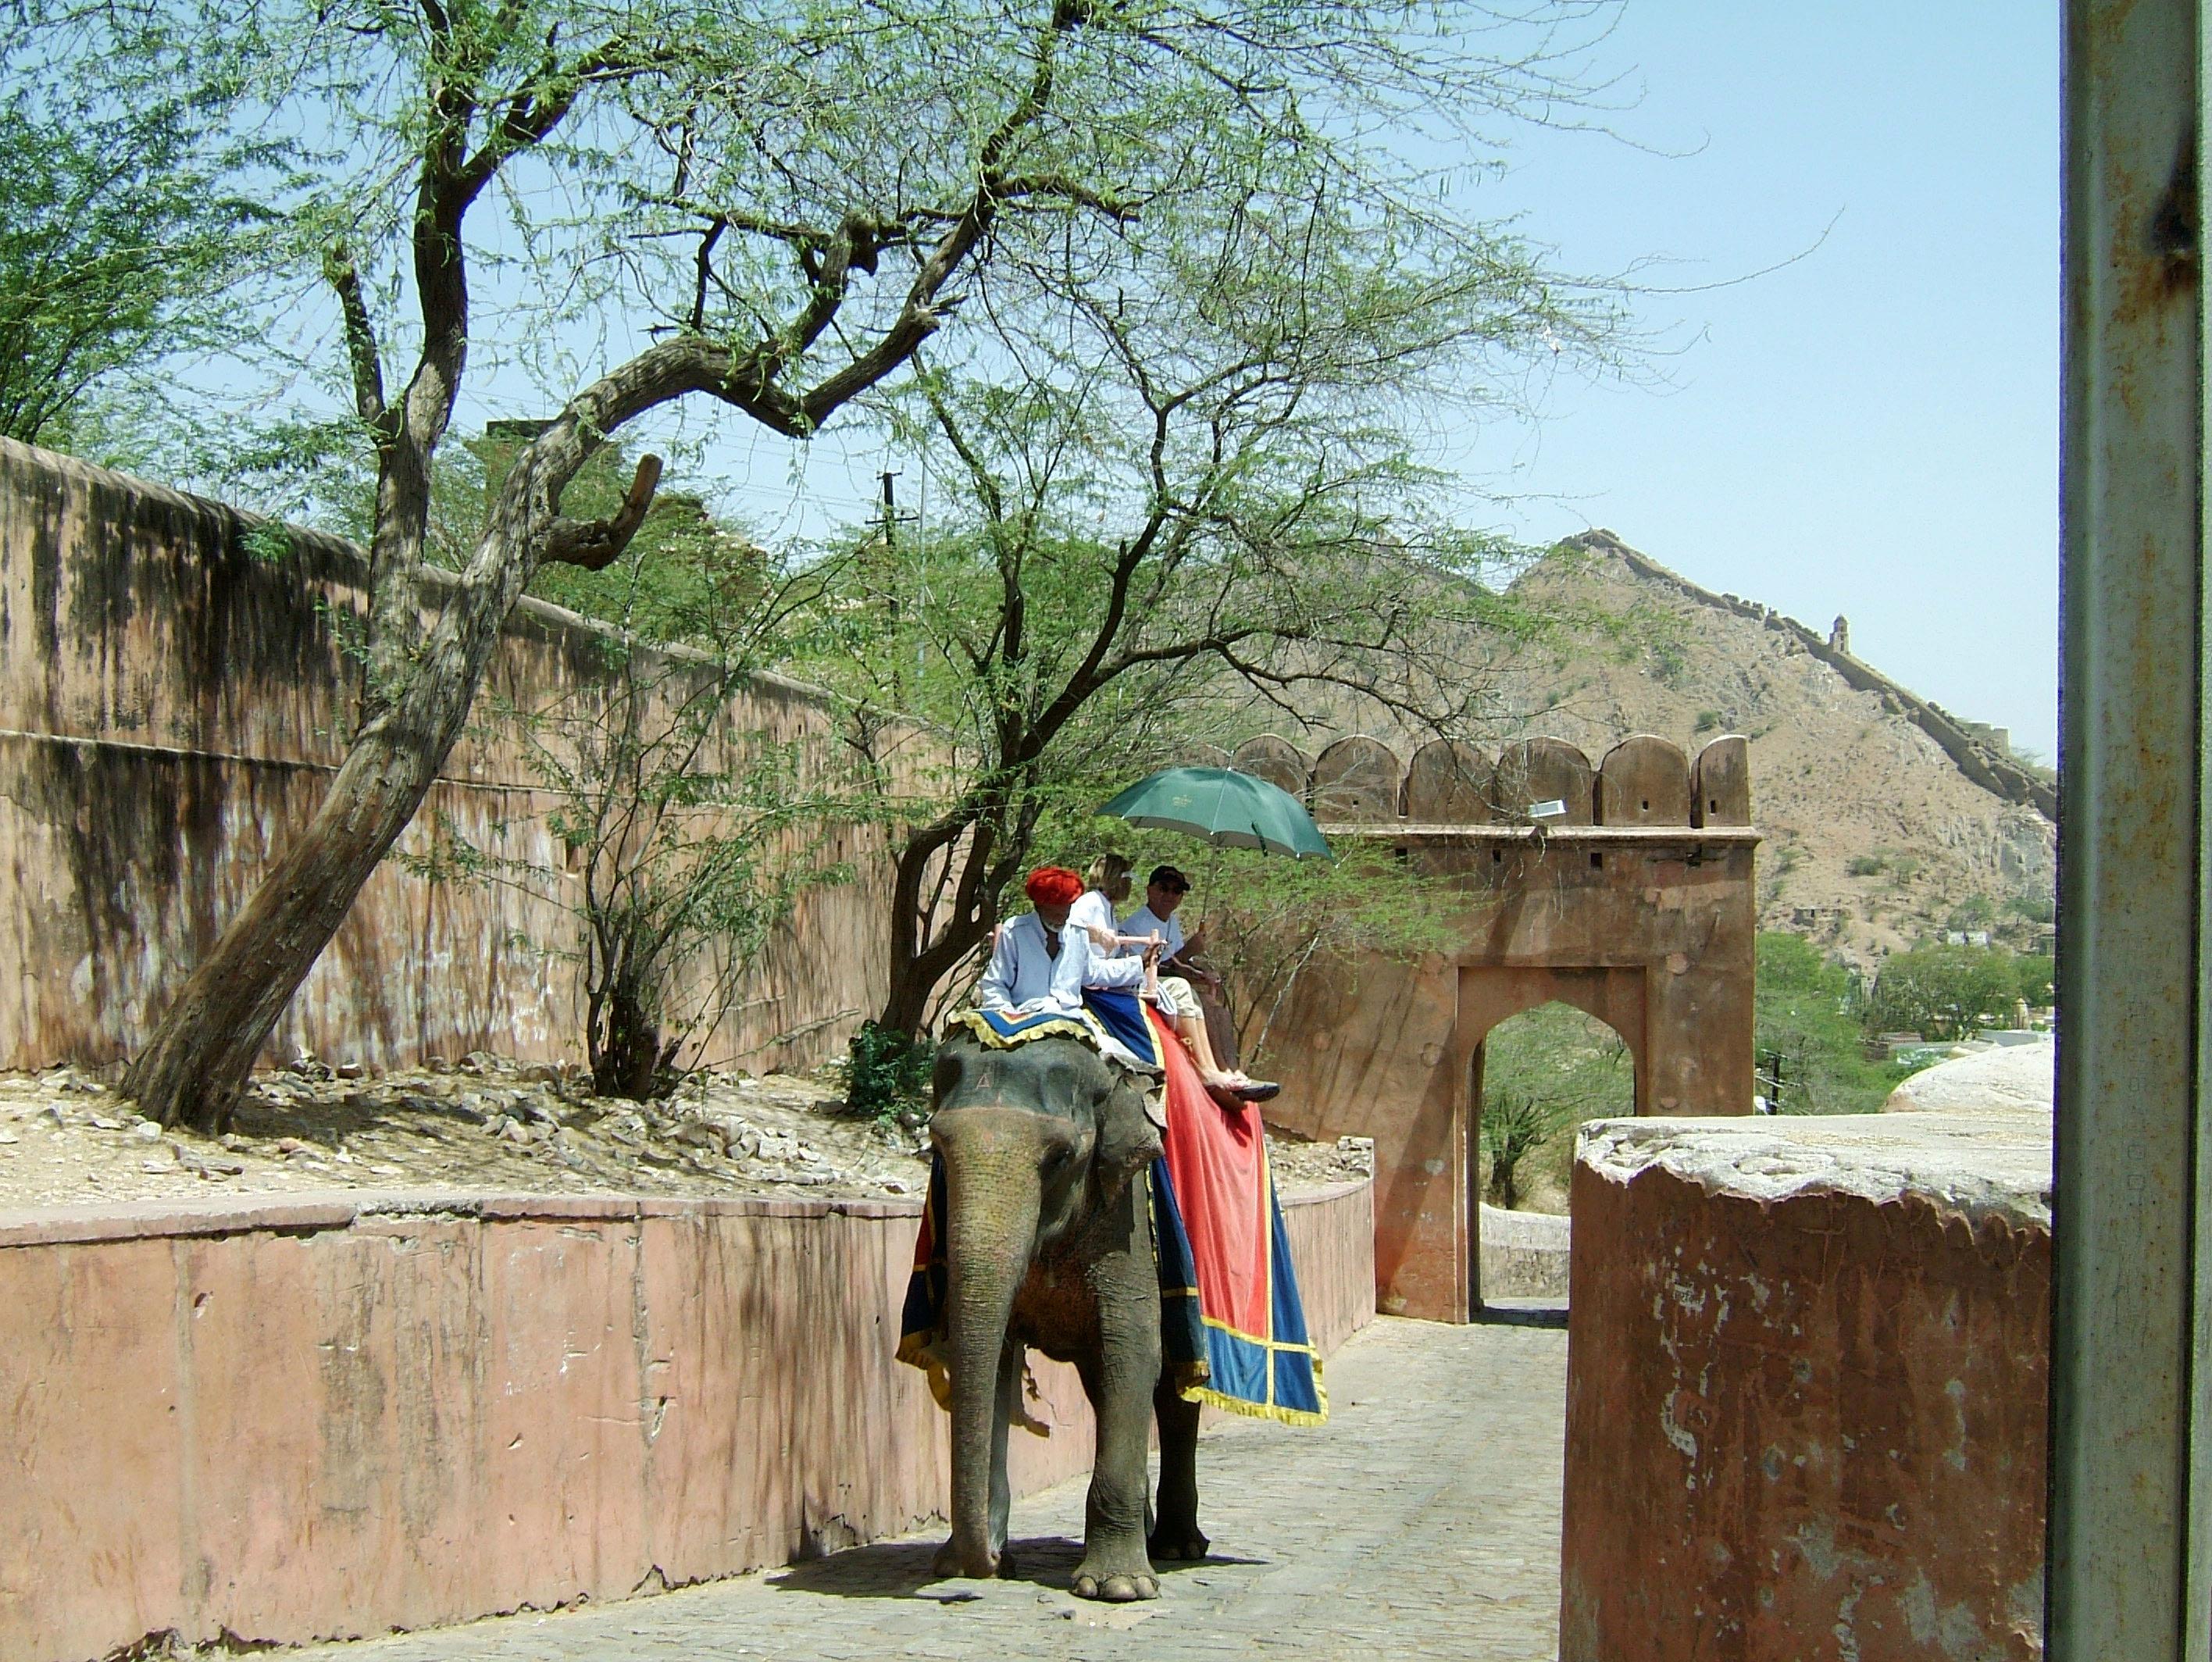 Elephant India Rajasthan Jaipur Amber Fort 01